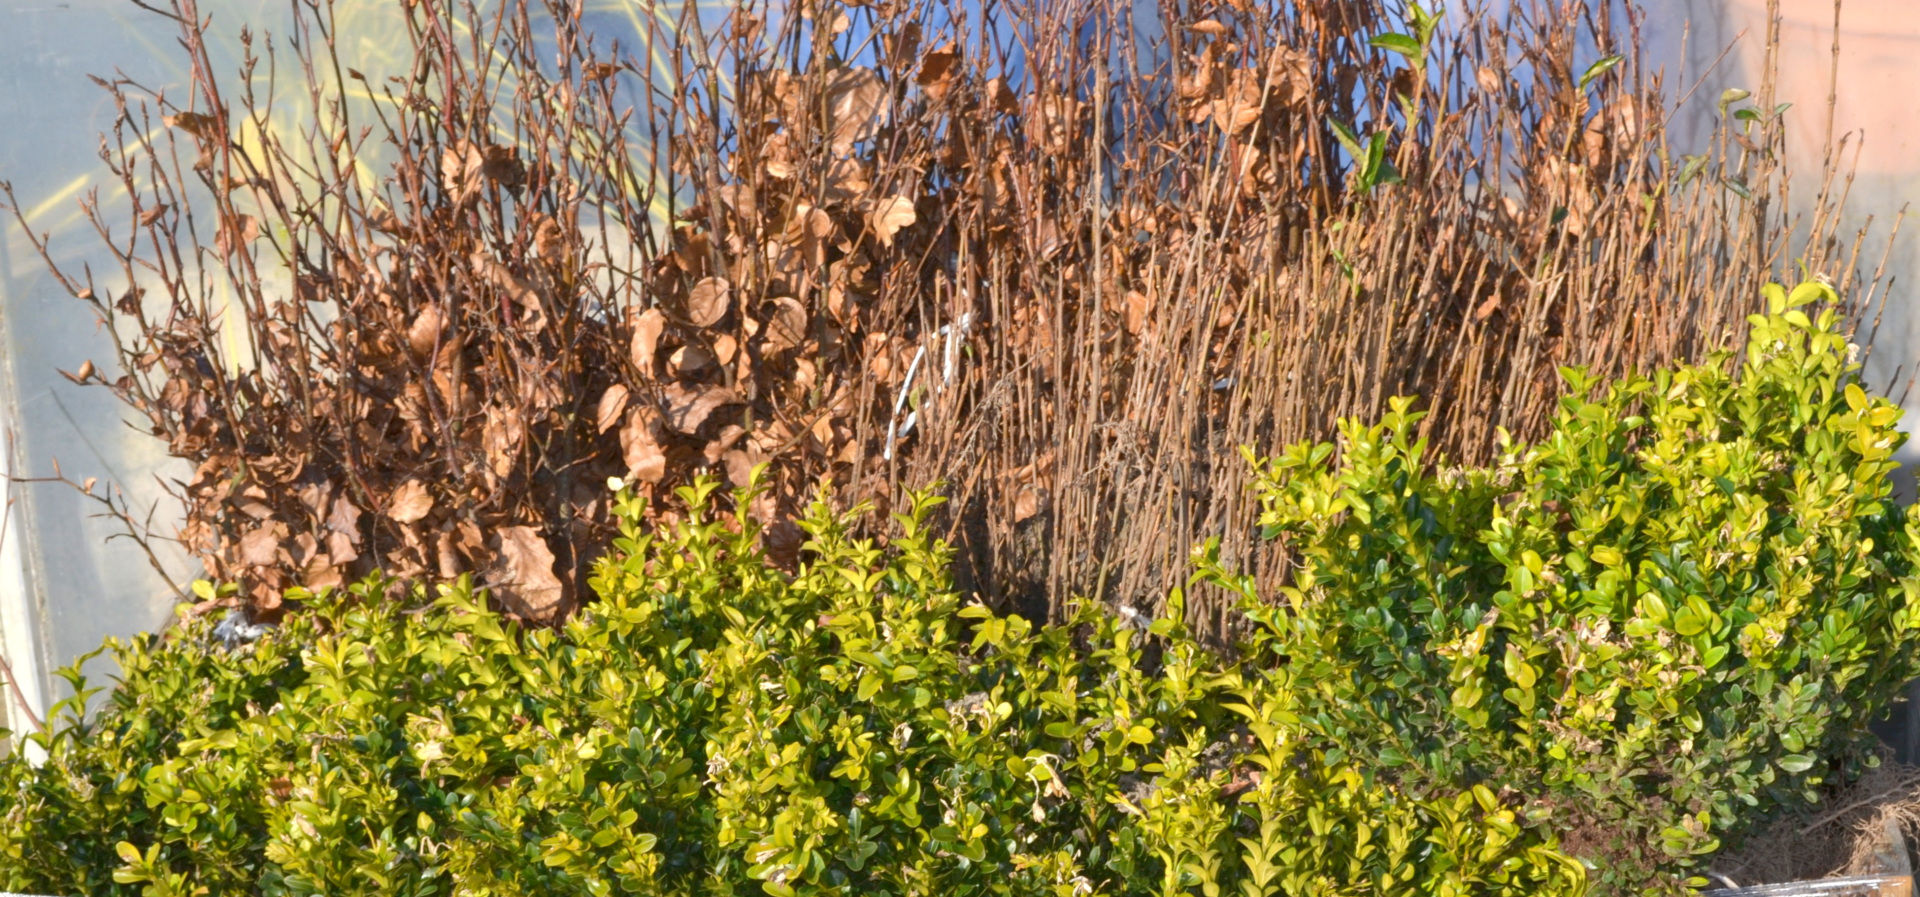 Garden Centre, Ben Vista, Plants, Hedge